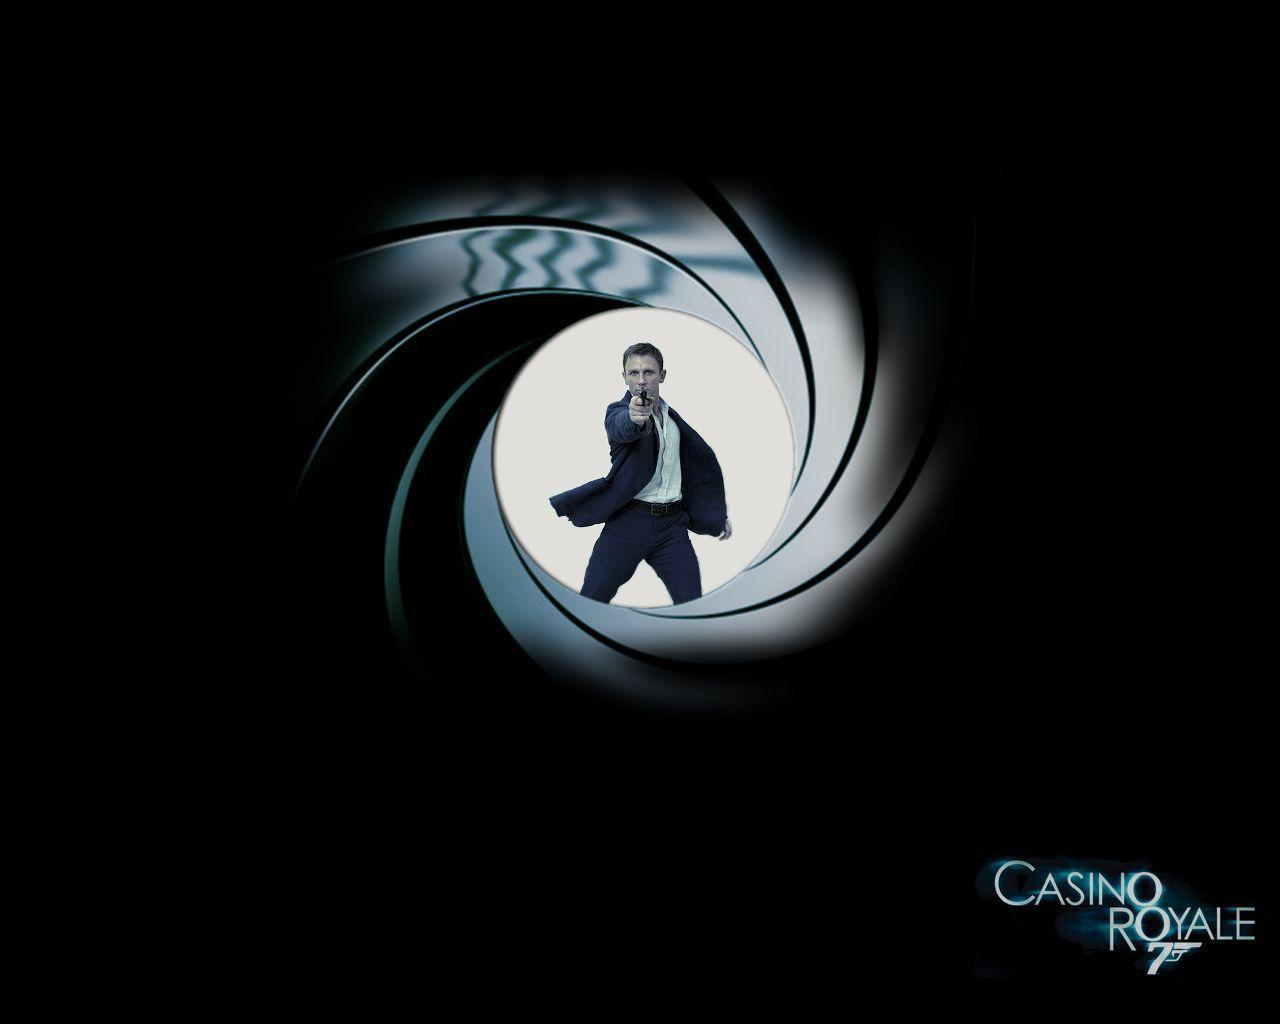 casino royale wallpaper poster - photo #30